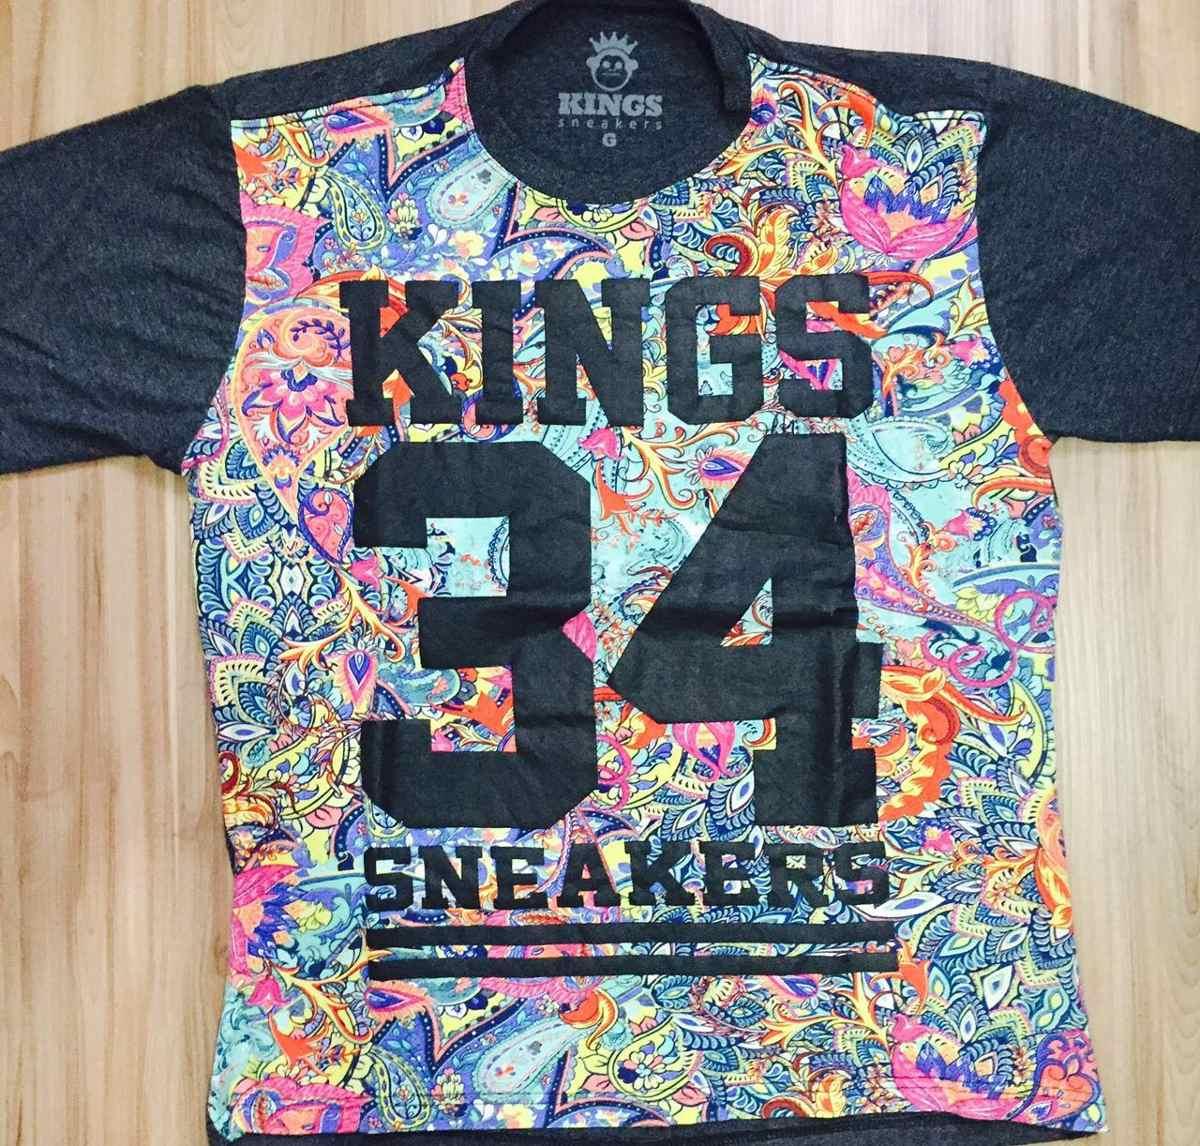 camisa kings sneakers 34 florida varias cores 100% original. Carregando  zoom. 31e08bb1cf223